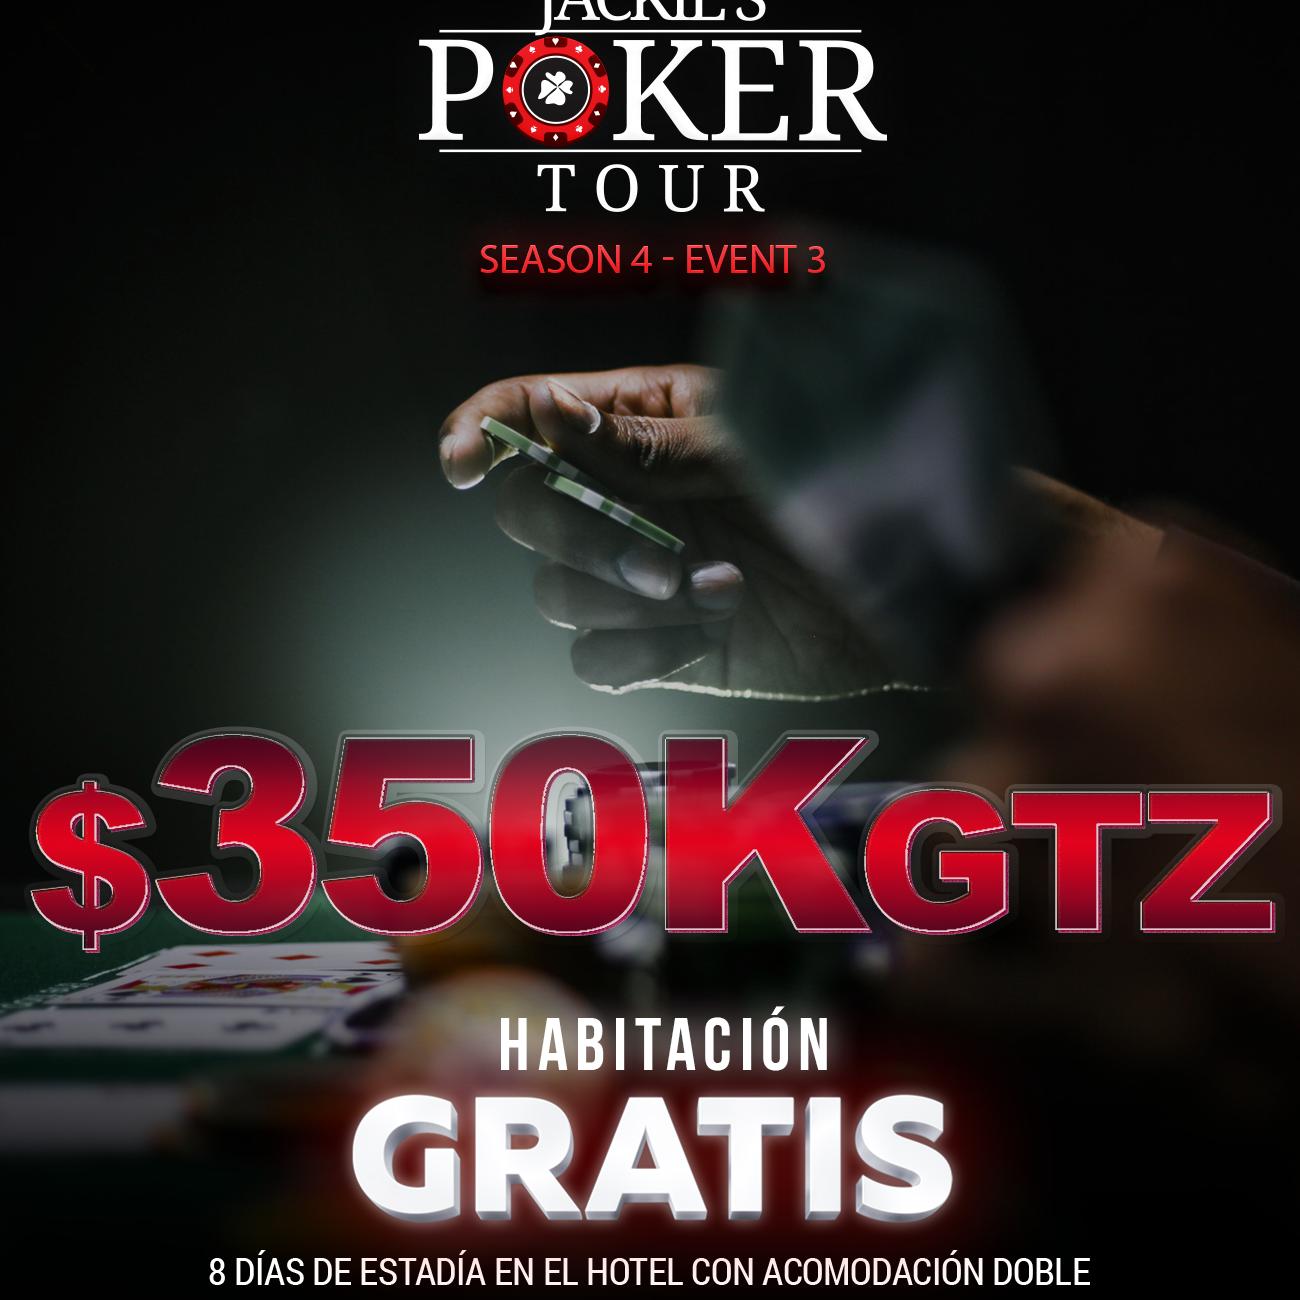 Torneo de PókerSeason 4 - Event 3con $350k GTZ